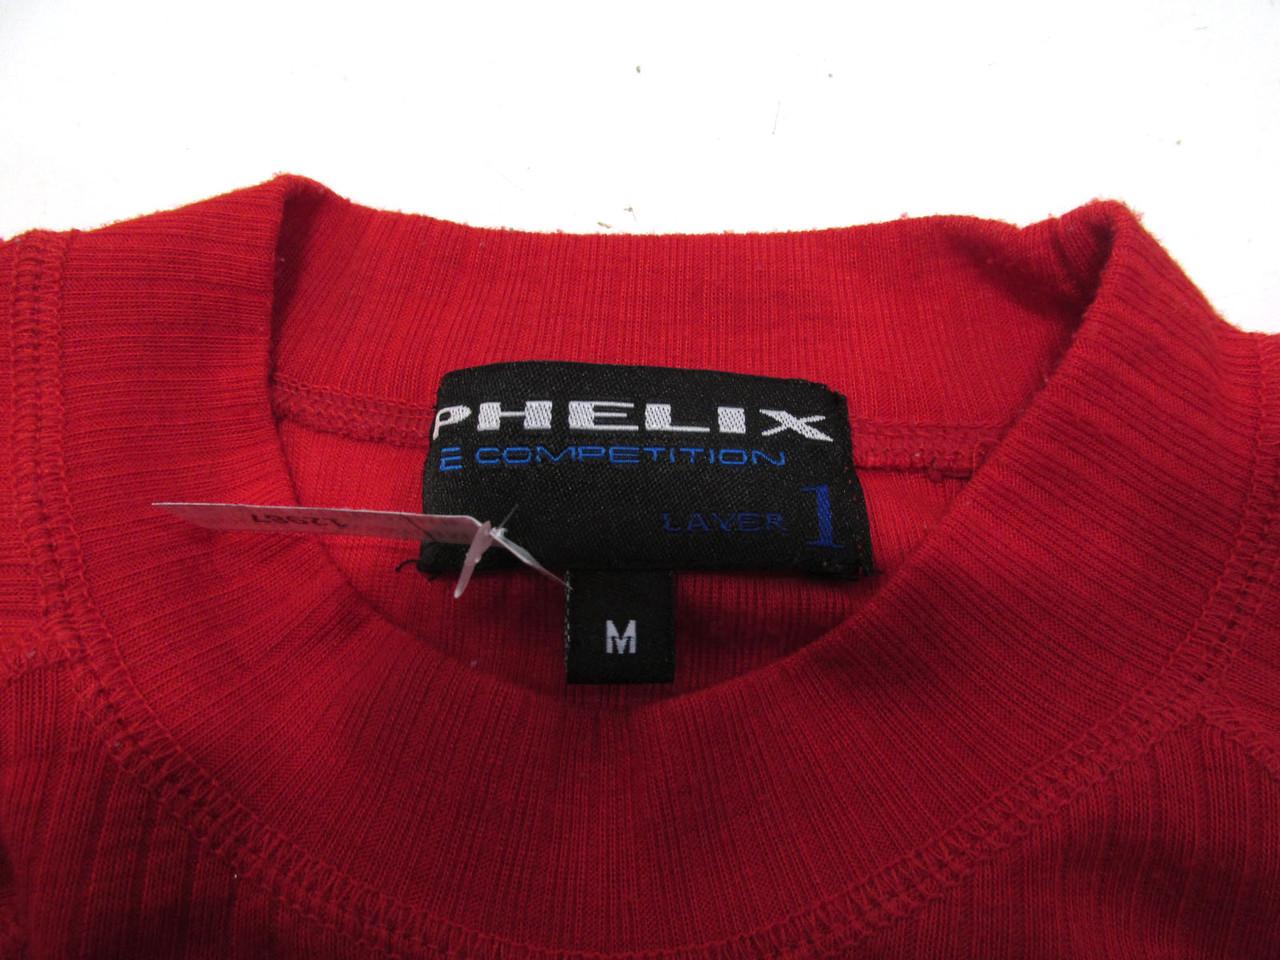 Термо кофта красная Phelix, М, Leyer 1, Хор сост! 7